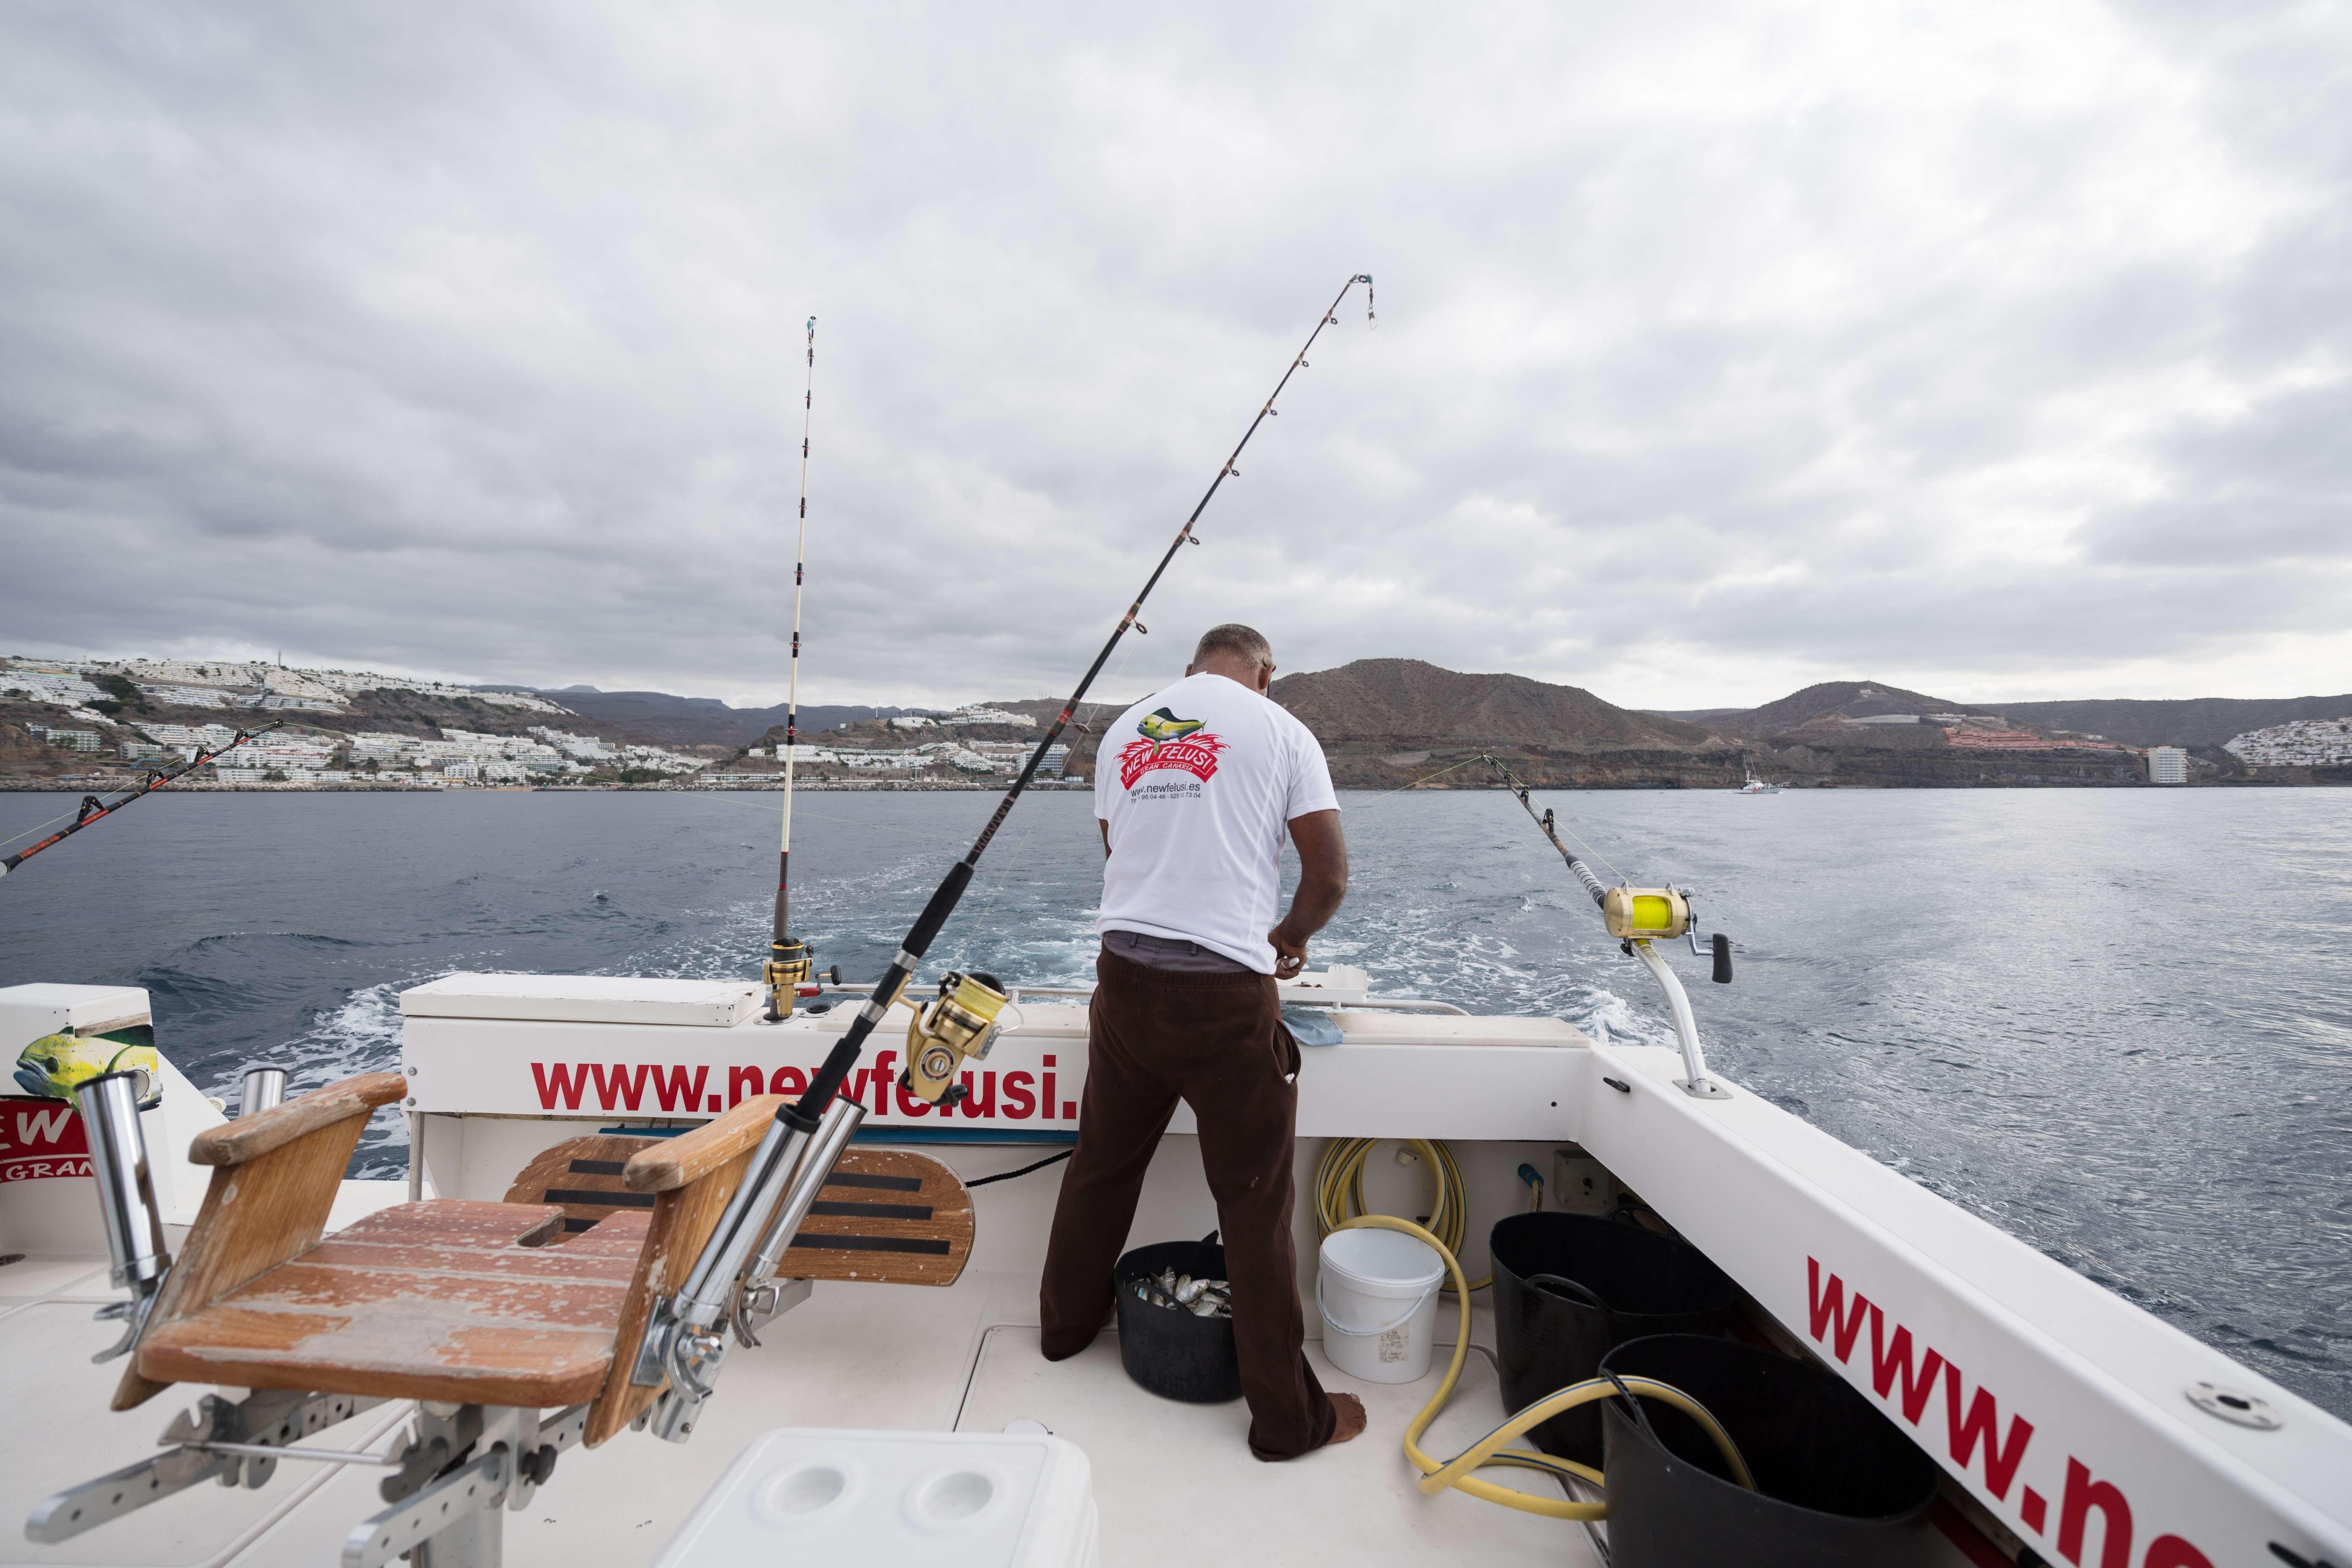 Aprender pesca de altura en Mogán, Gran Canaria